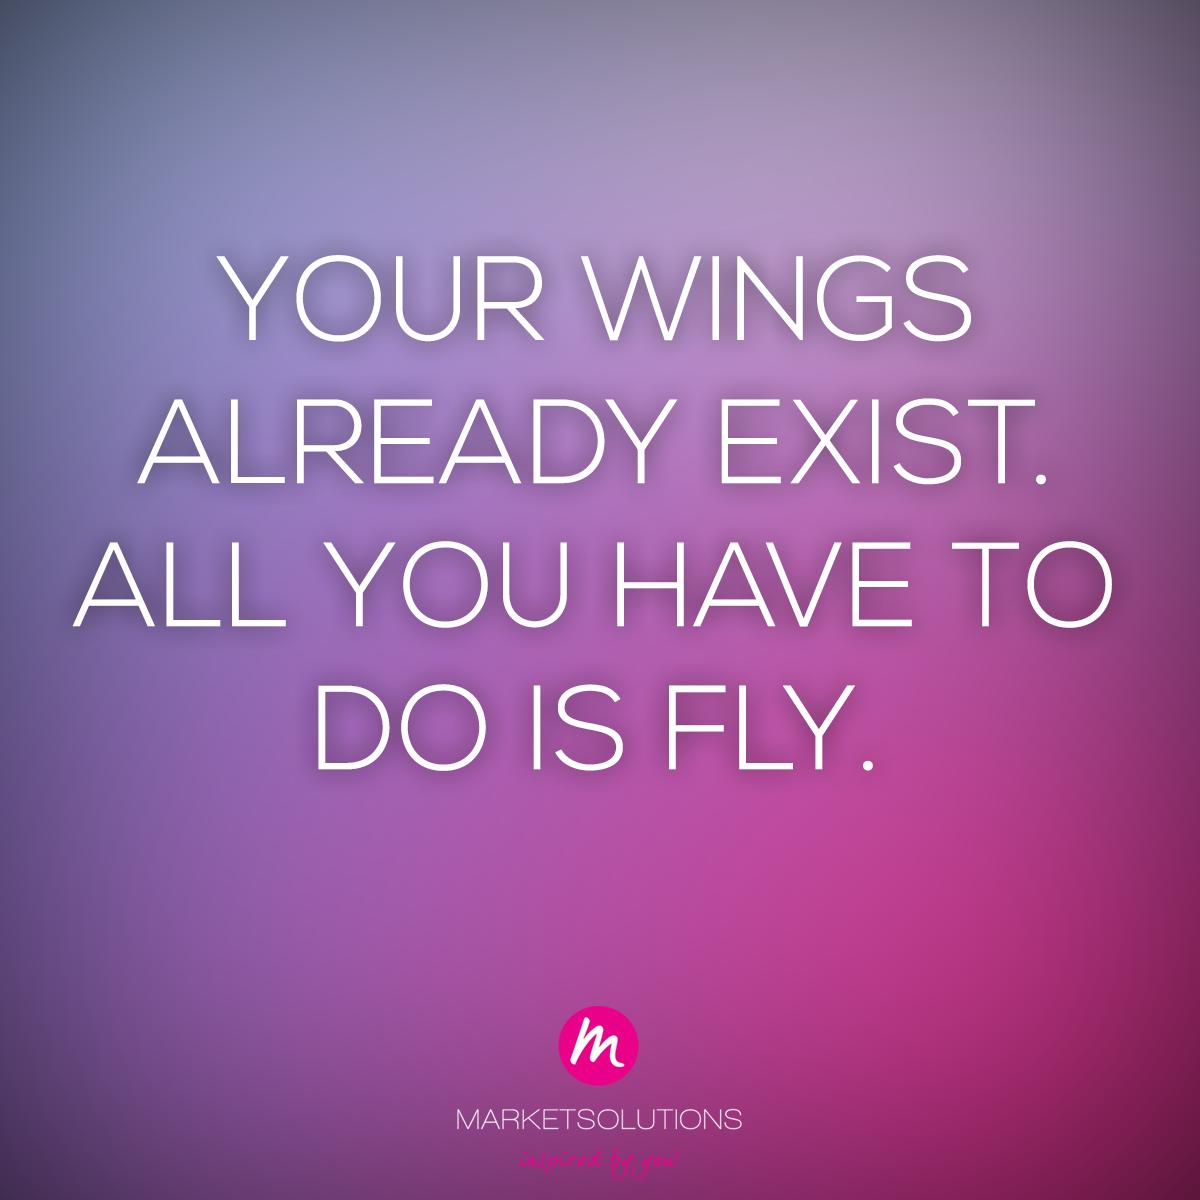 #mindset #ondernemen #entrepreneurship #zzp #success #inspiration #quote #growthmindset #mkb #ondernemer #inspiratie #flow